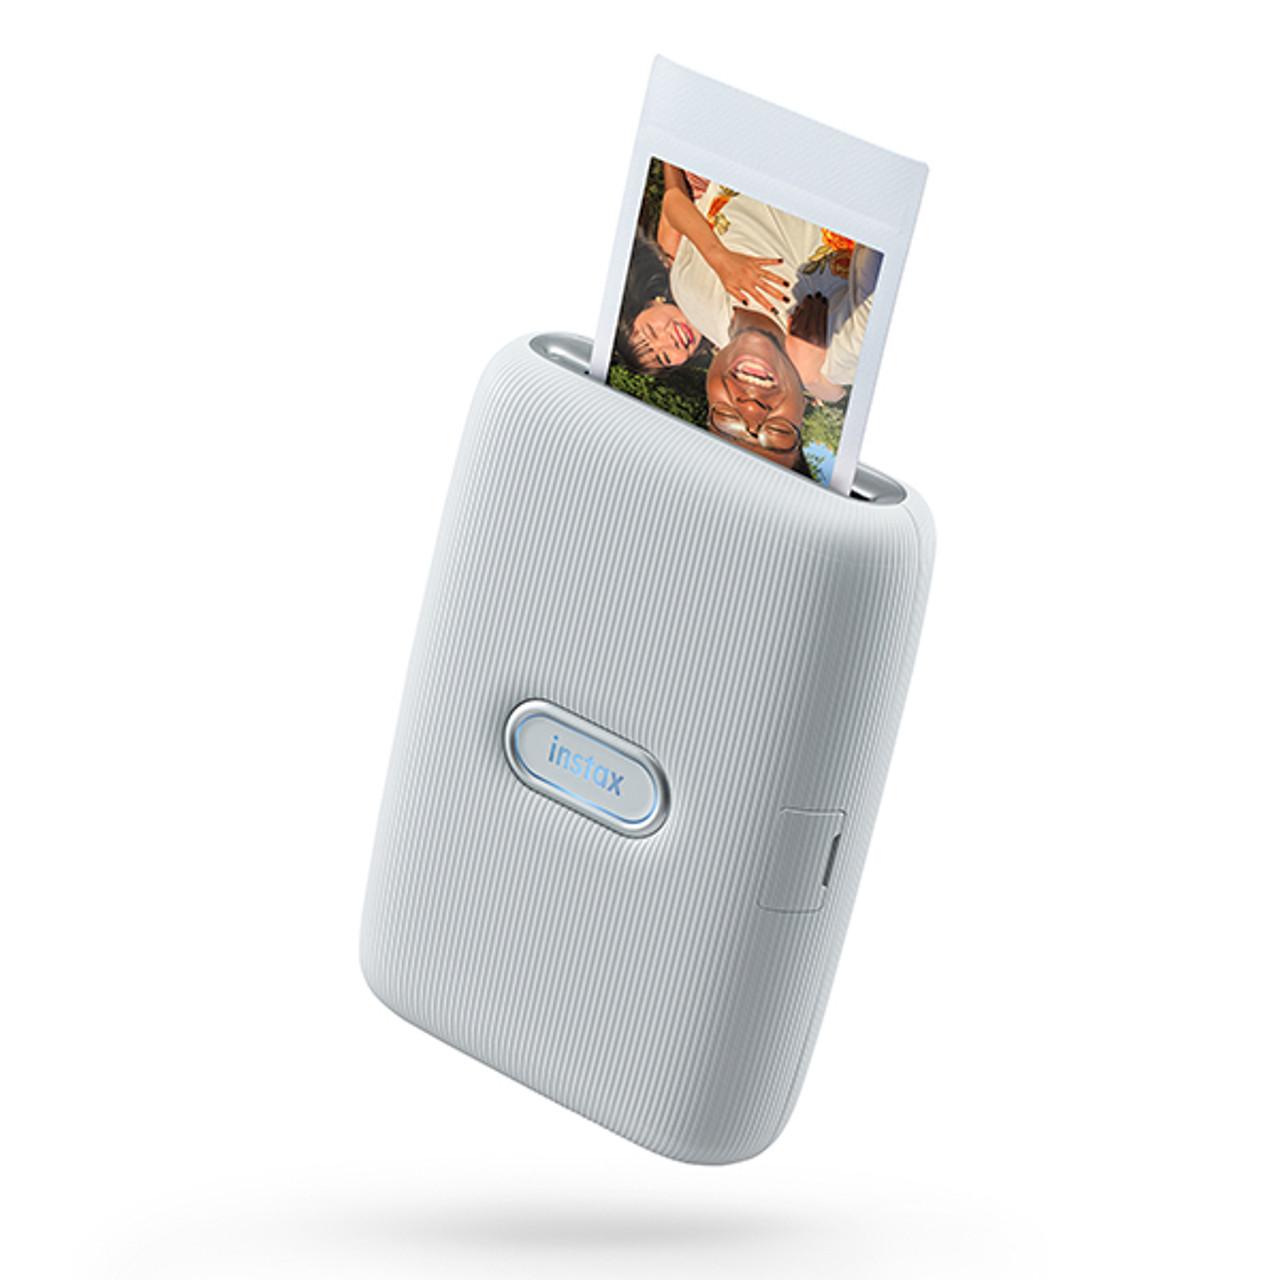 FUJIFILM INSTAX MINI LINK SMARTPHONE PRINTER (DUSKY PINK)